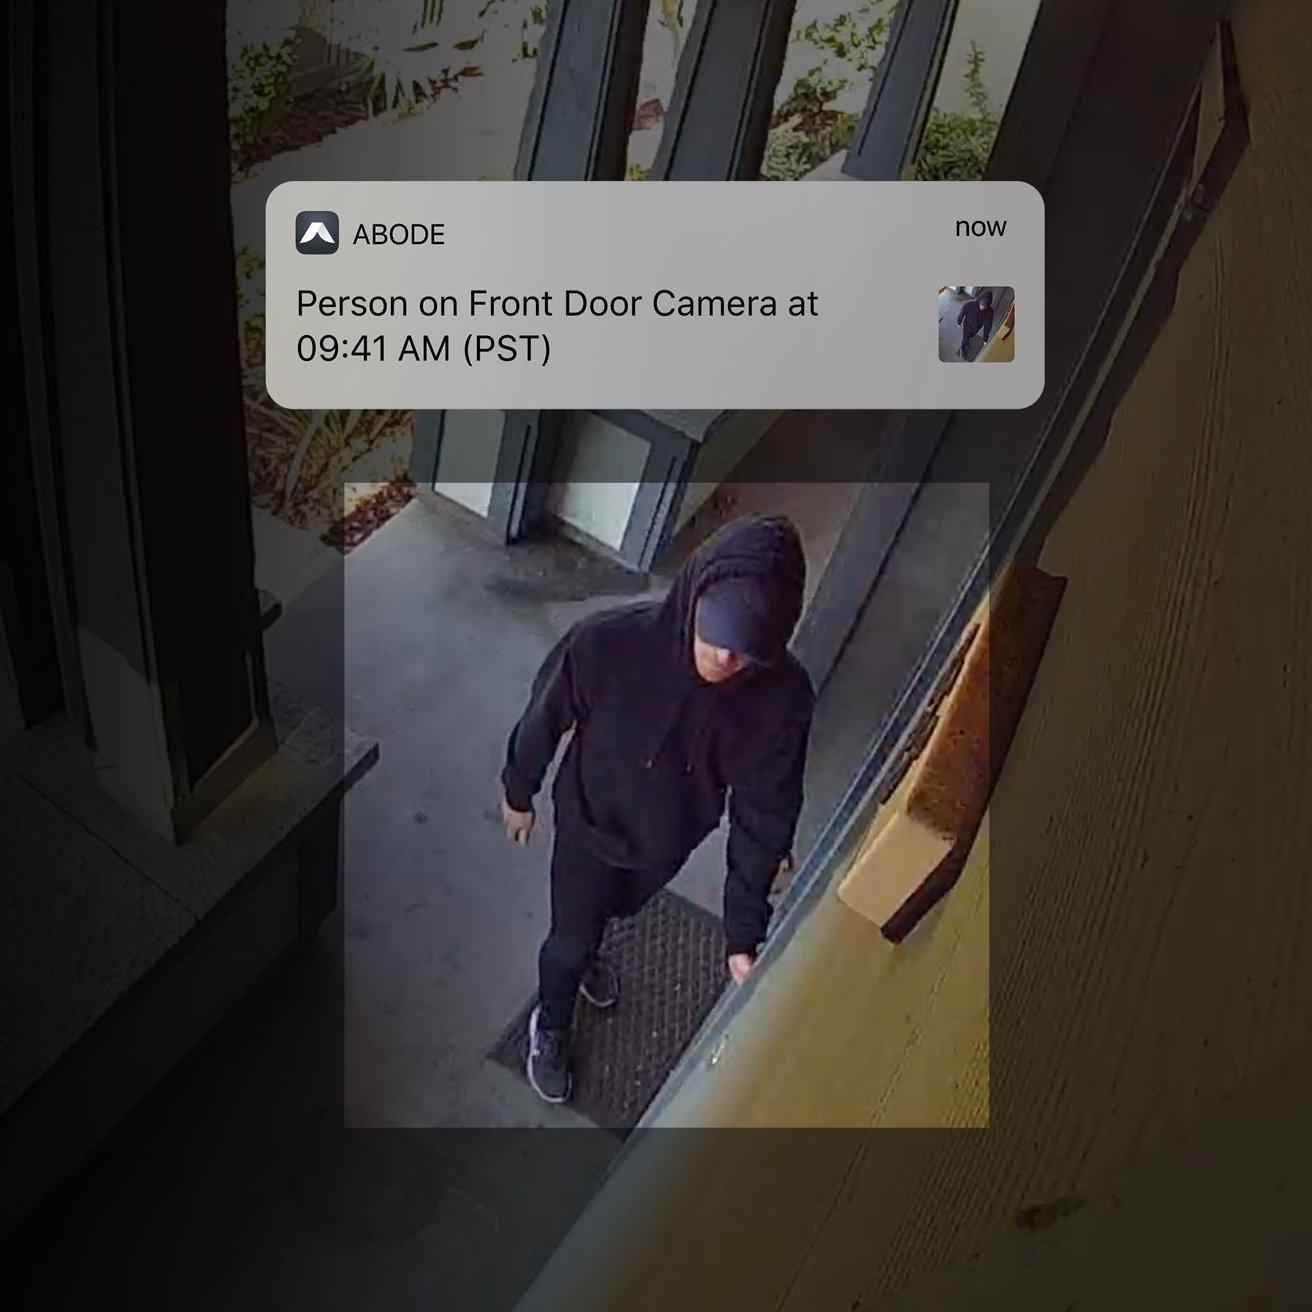 Abode Smart Detect